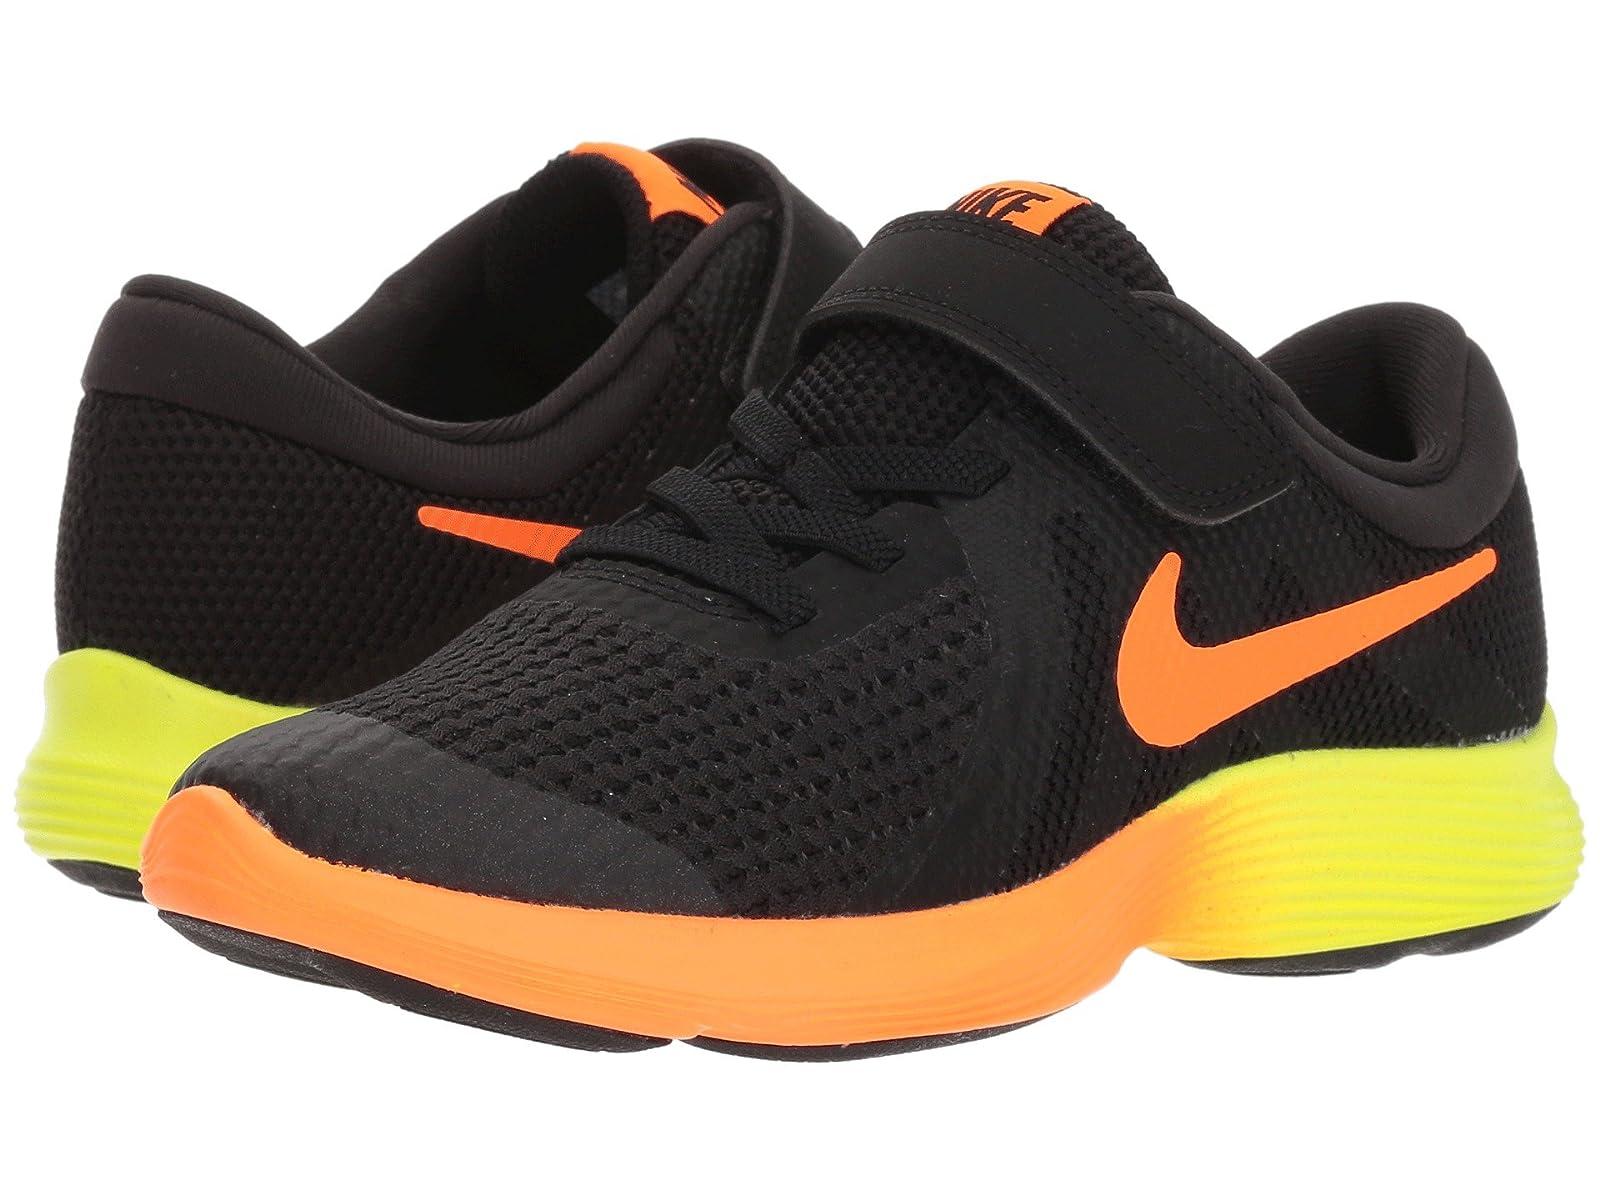 Nike Kids Revolution 4 Fade (Little Kid)Atmospheric grades have affordable shoes